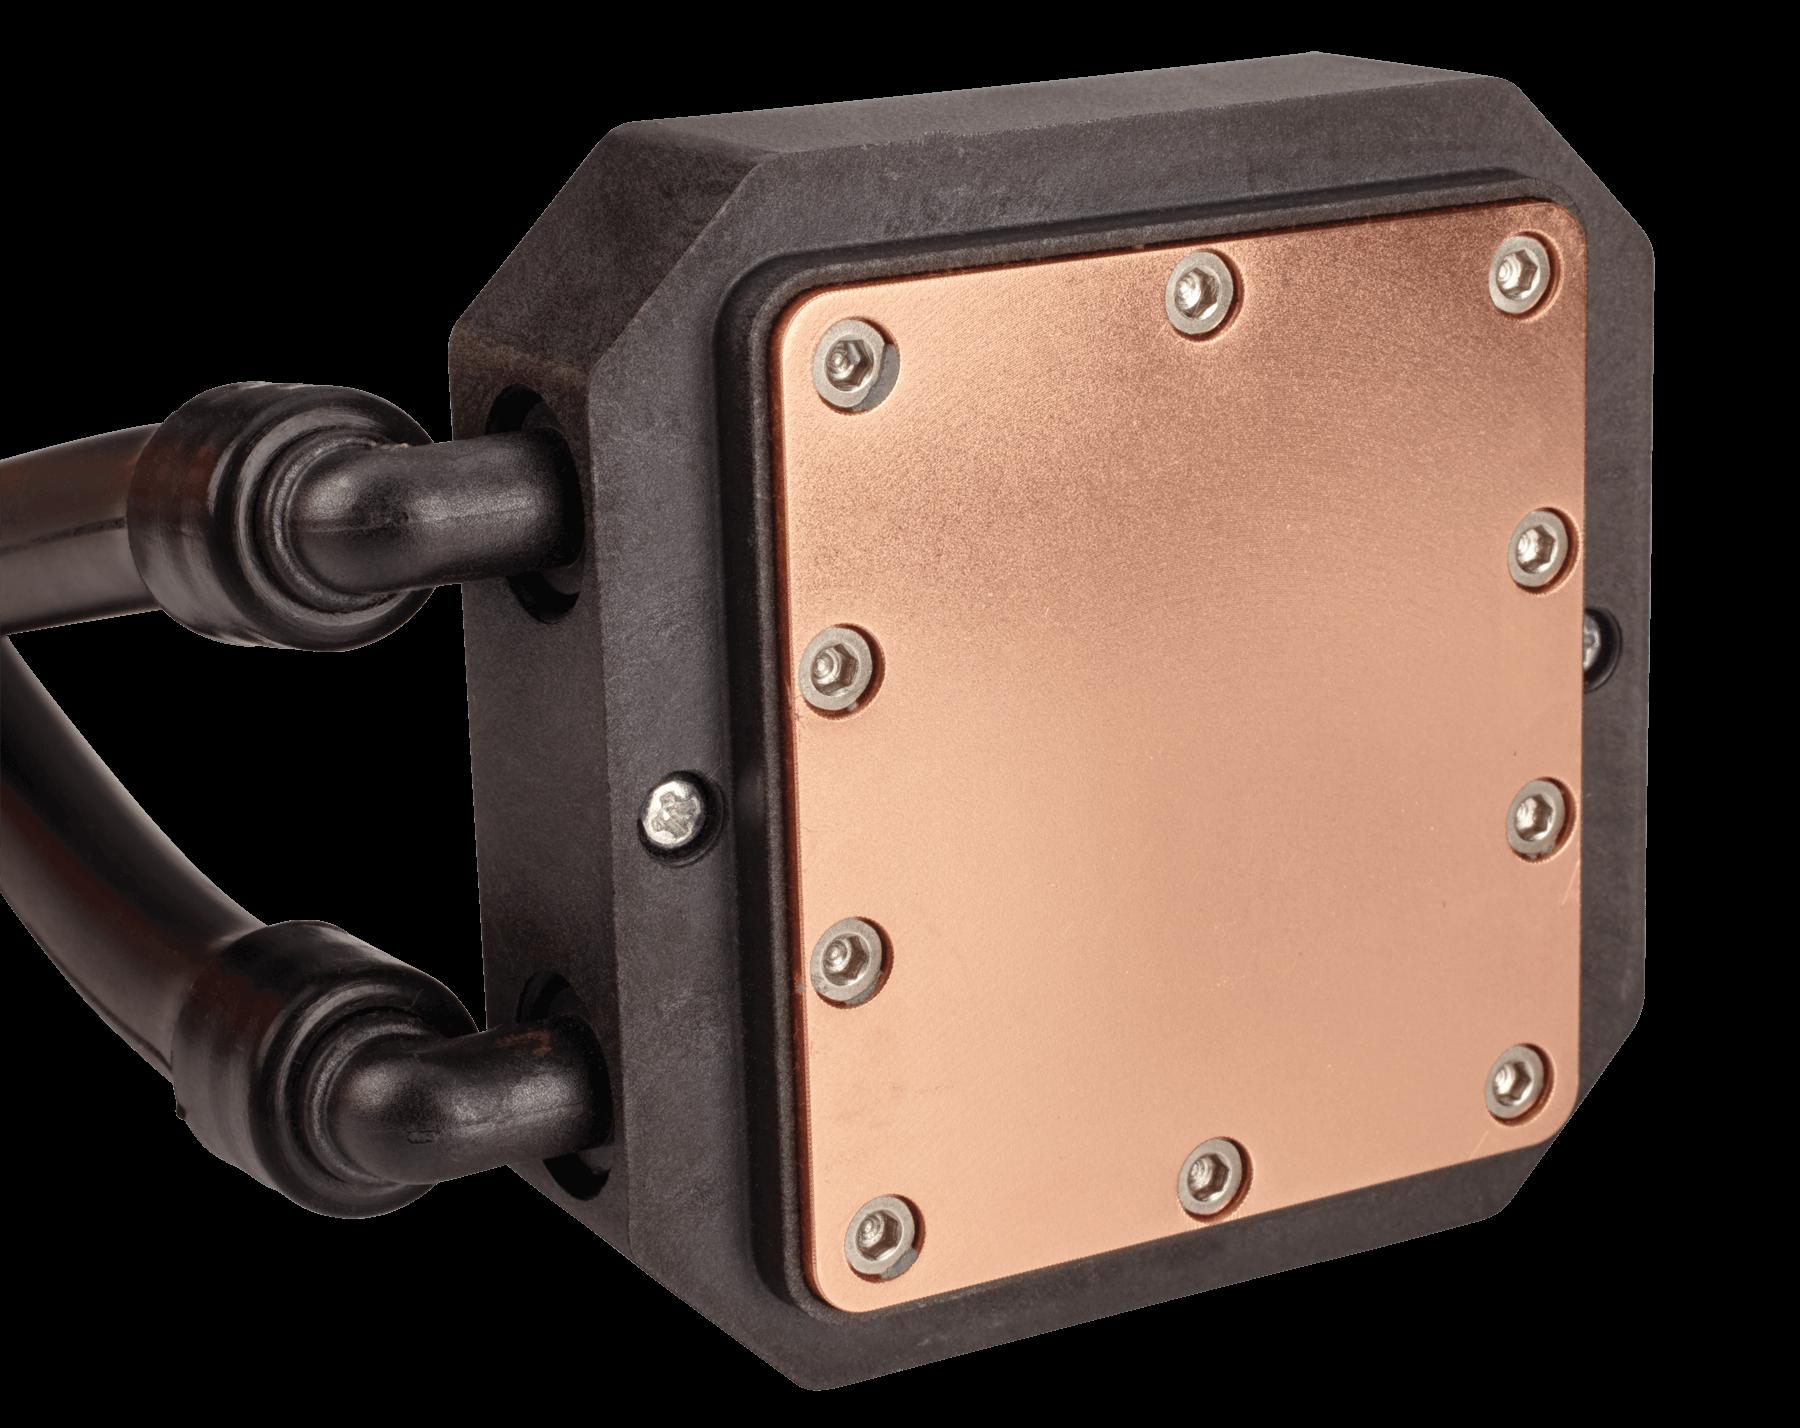 CORSAIR H45 CW-9060028-WW Sıvı Soğutma Sistemi 1150, 1151, 1155, 1156, 1366, 2011, 2011v3/AM3,FM2